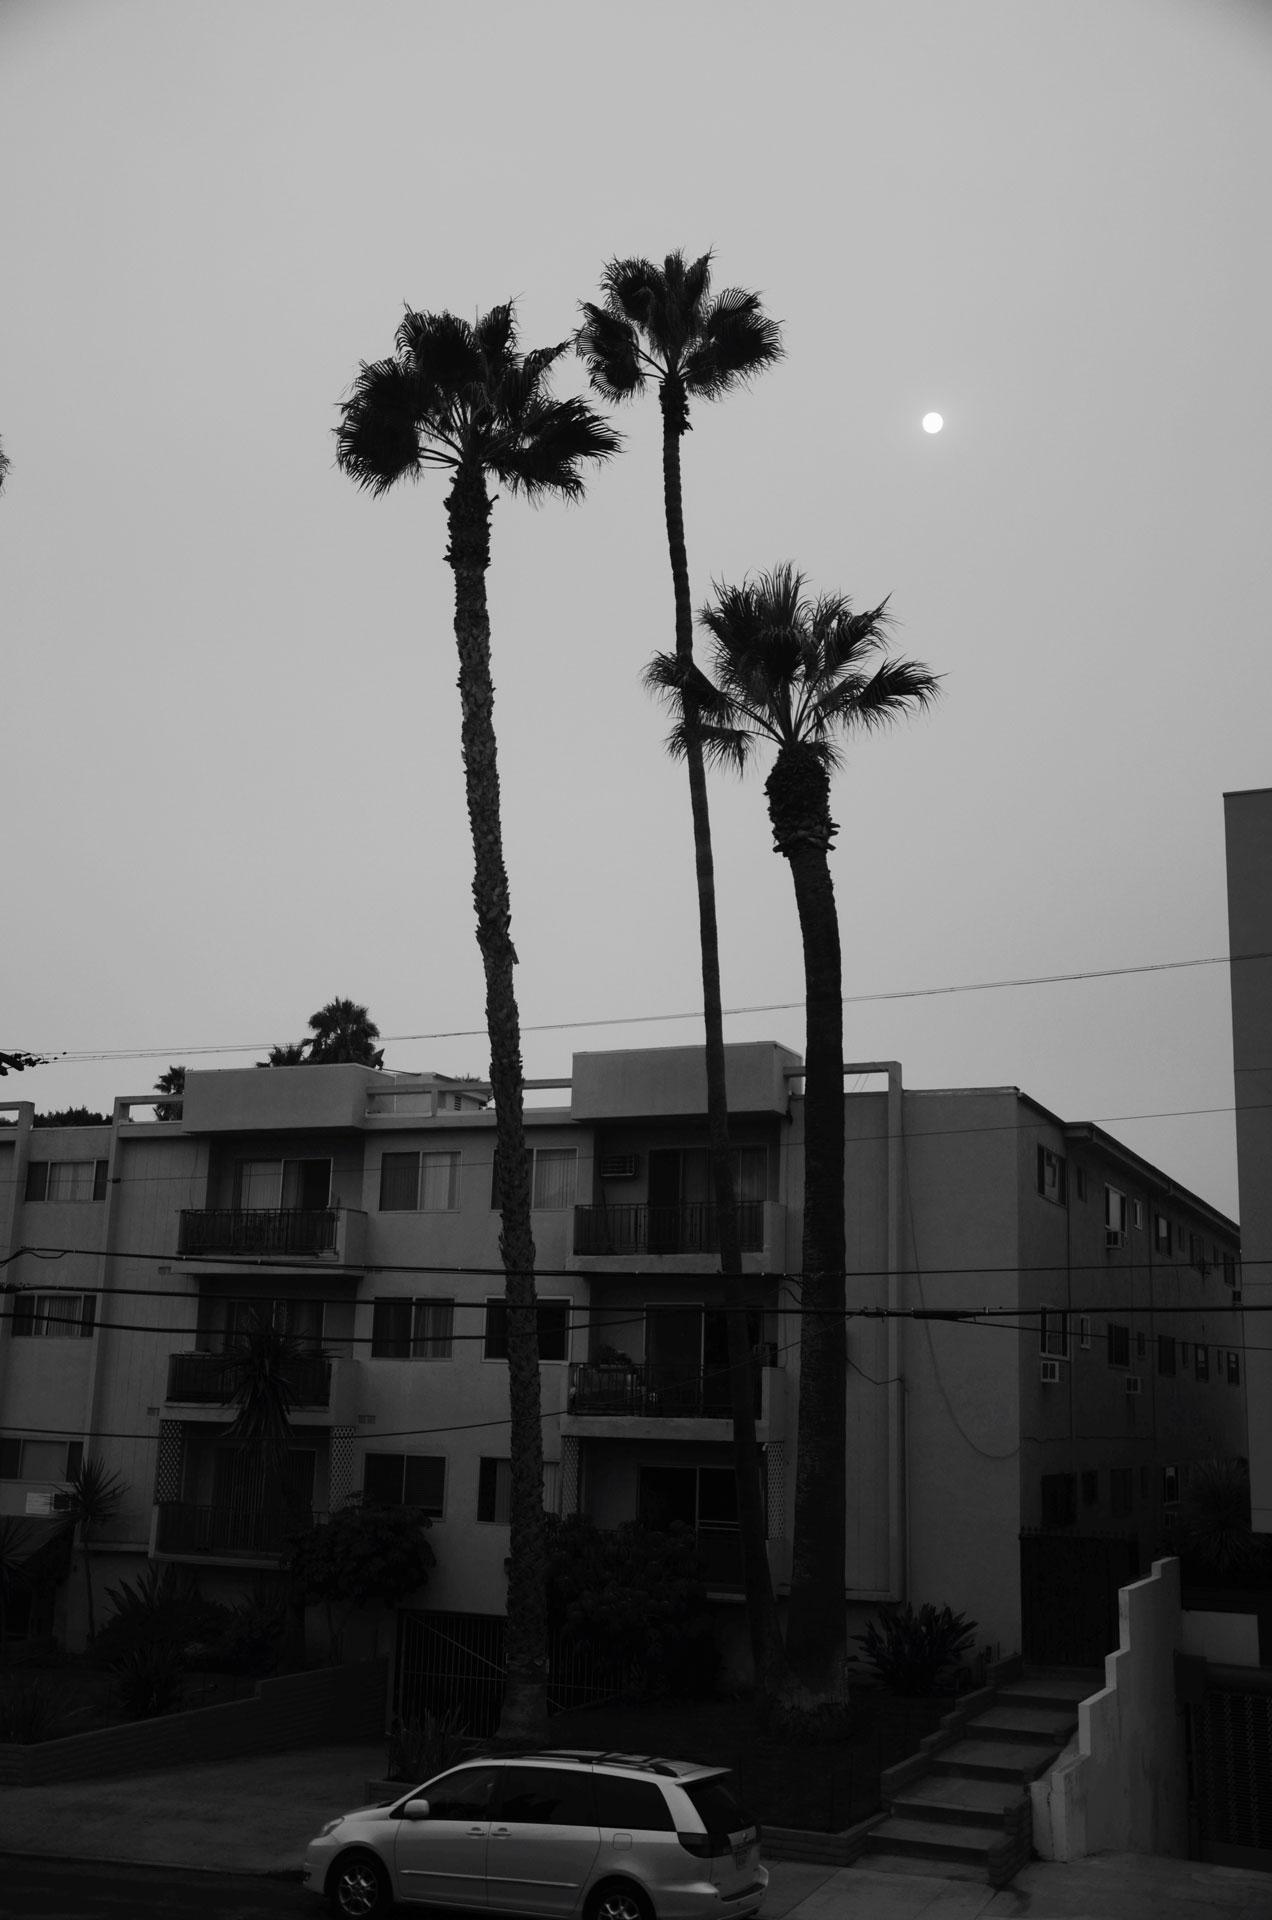 My street view